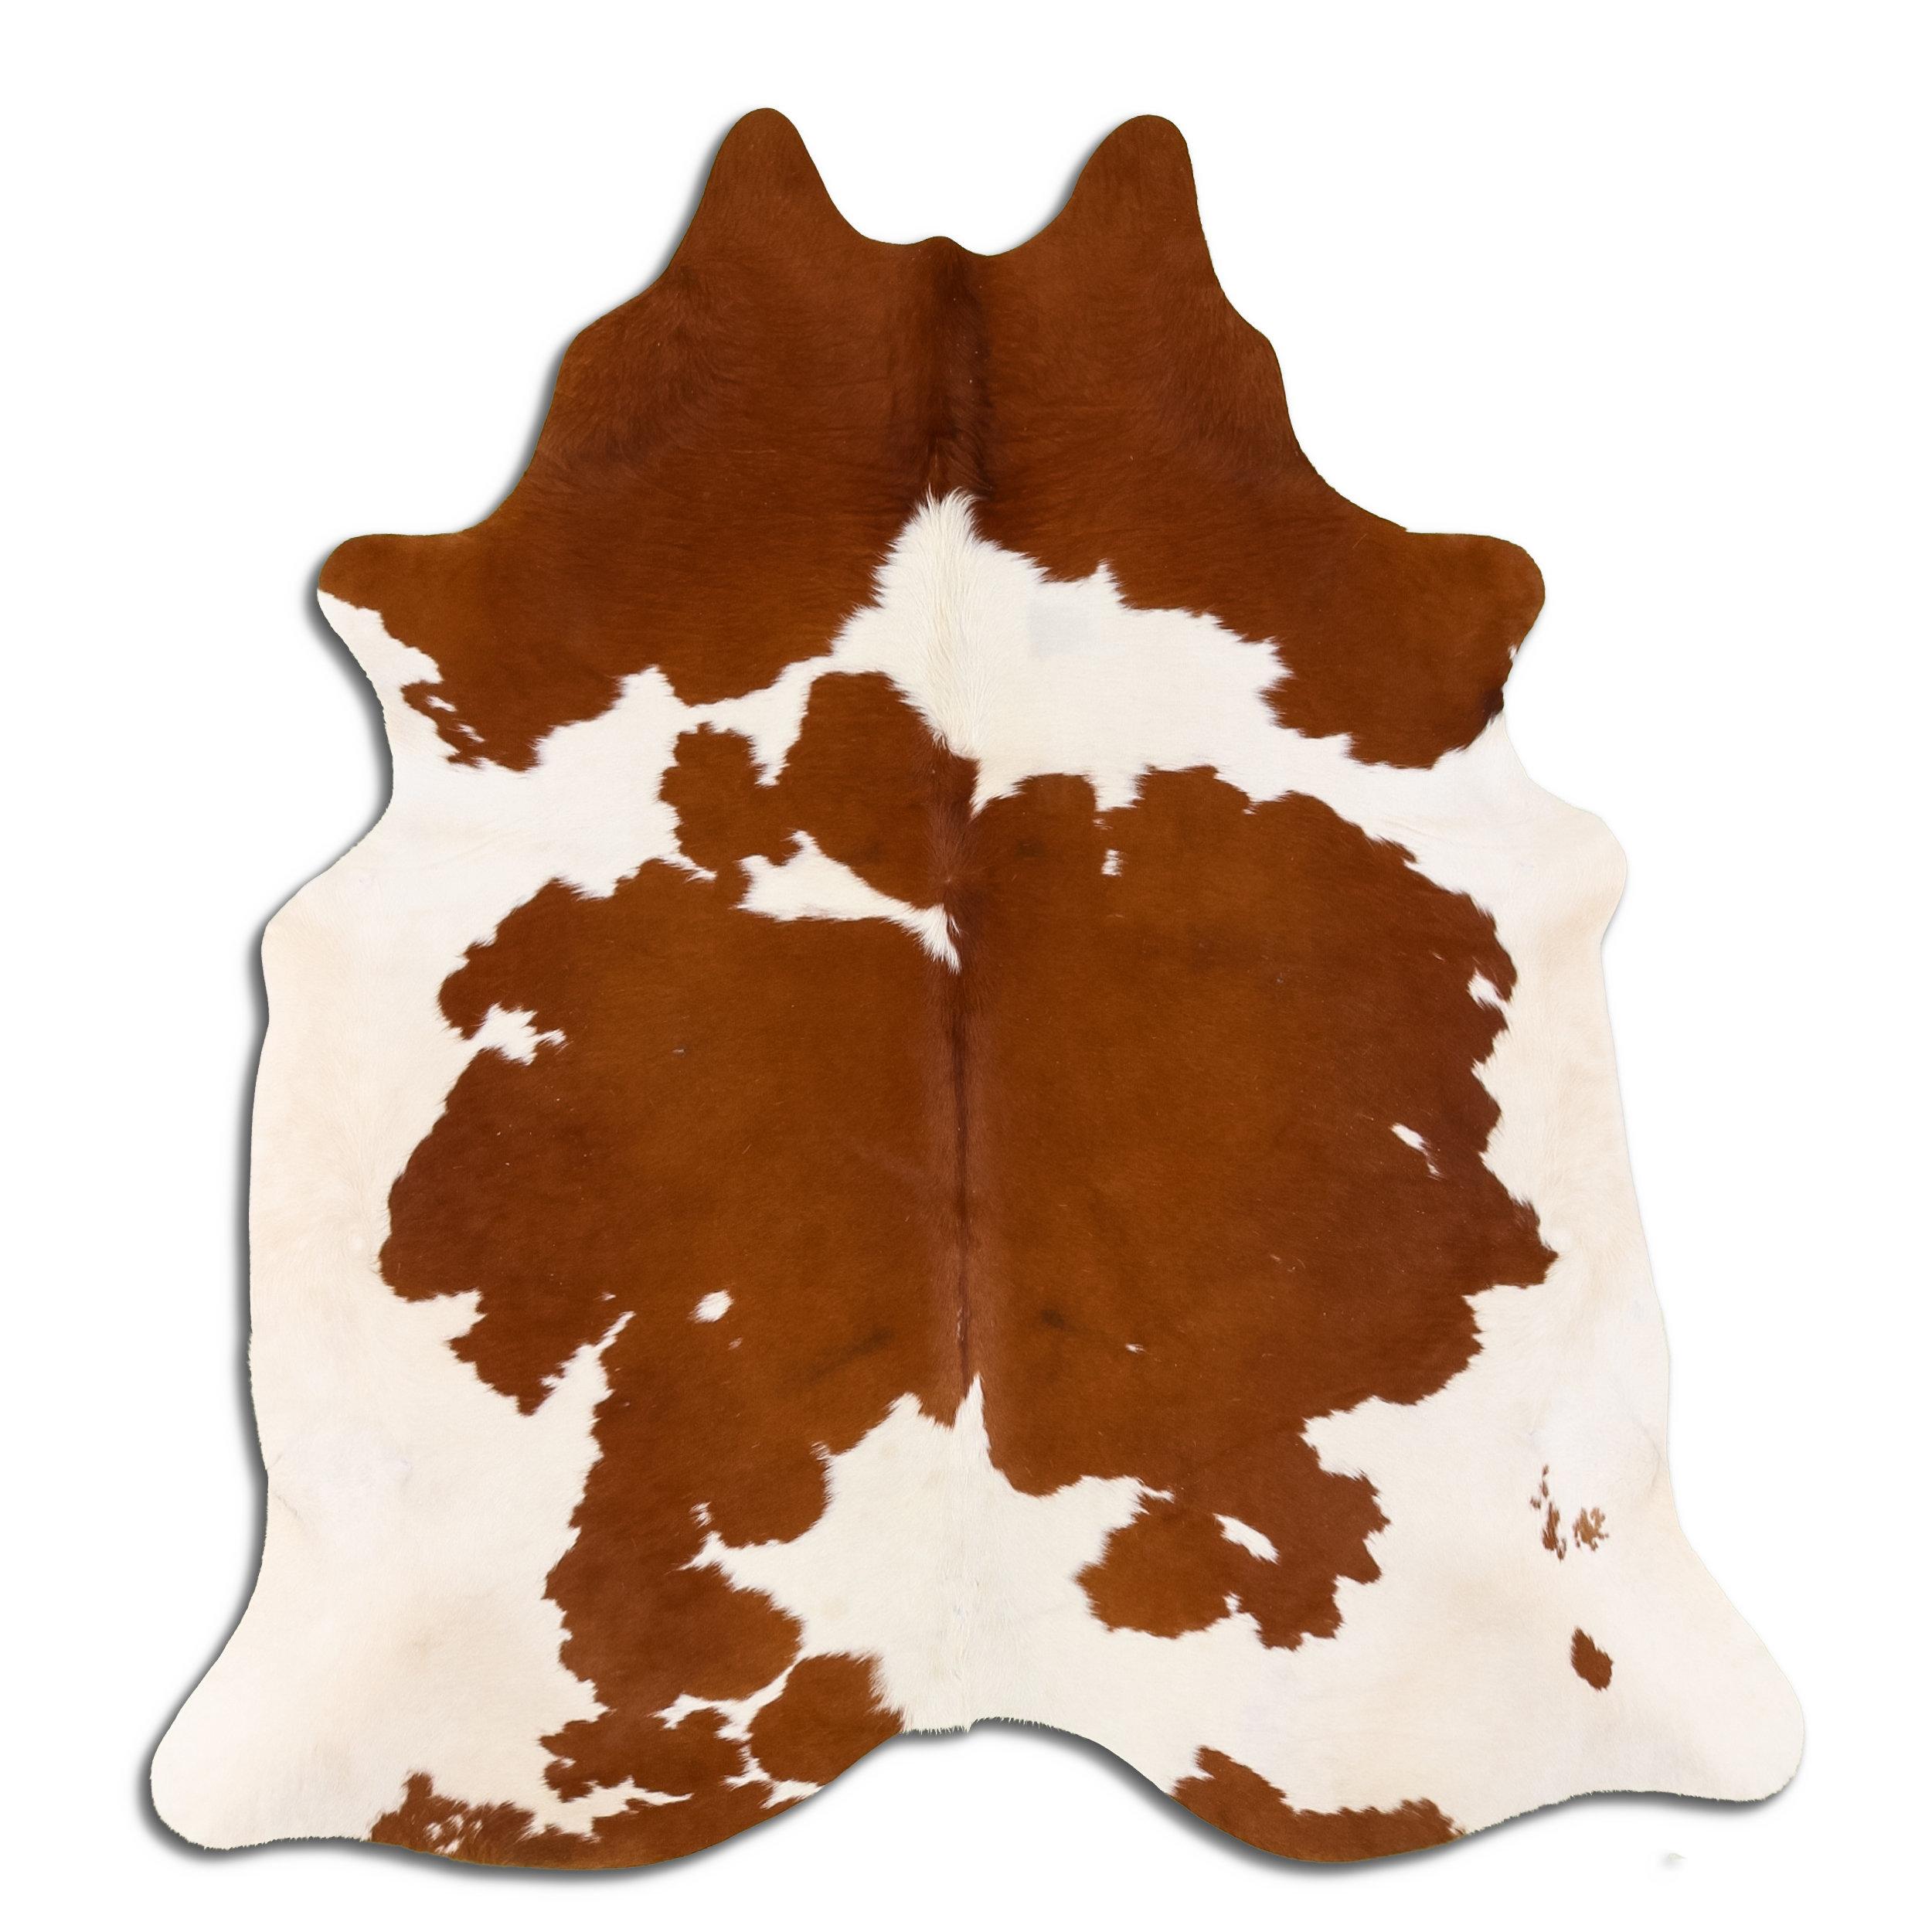 Union Rustic Durden Handmade Leather Brown Area Rug Wayfair